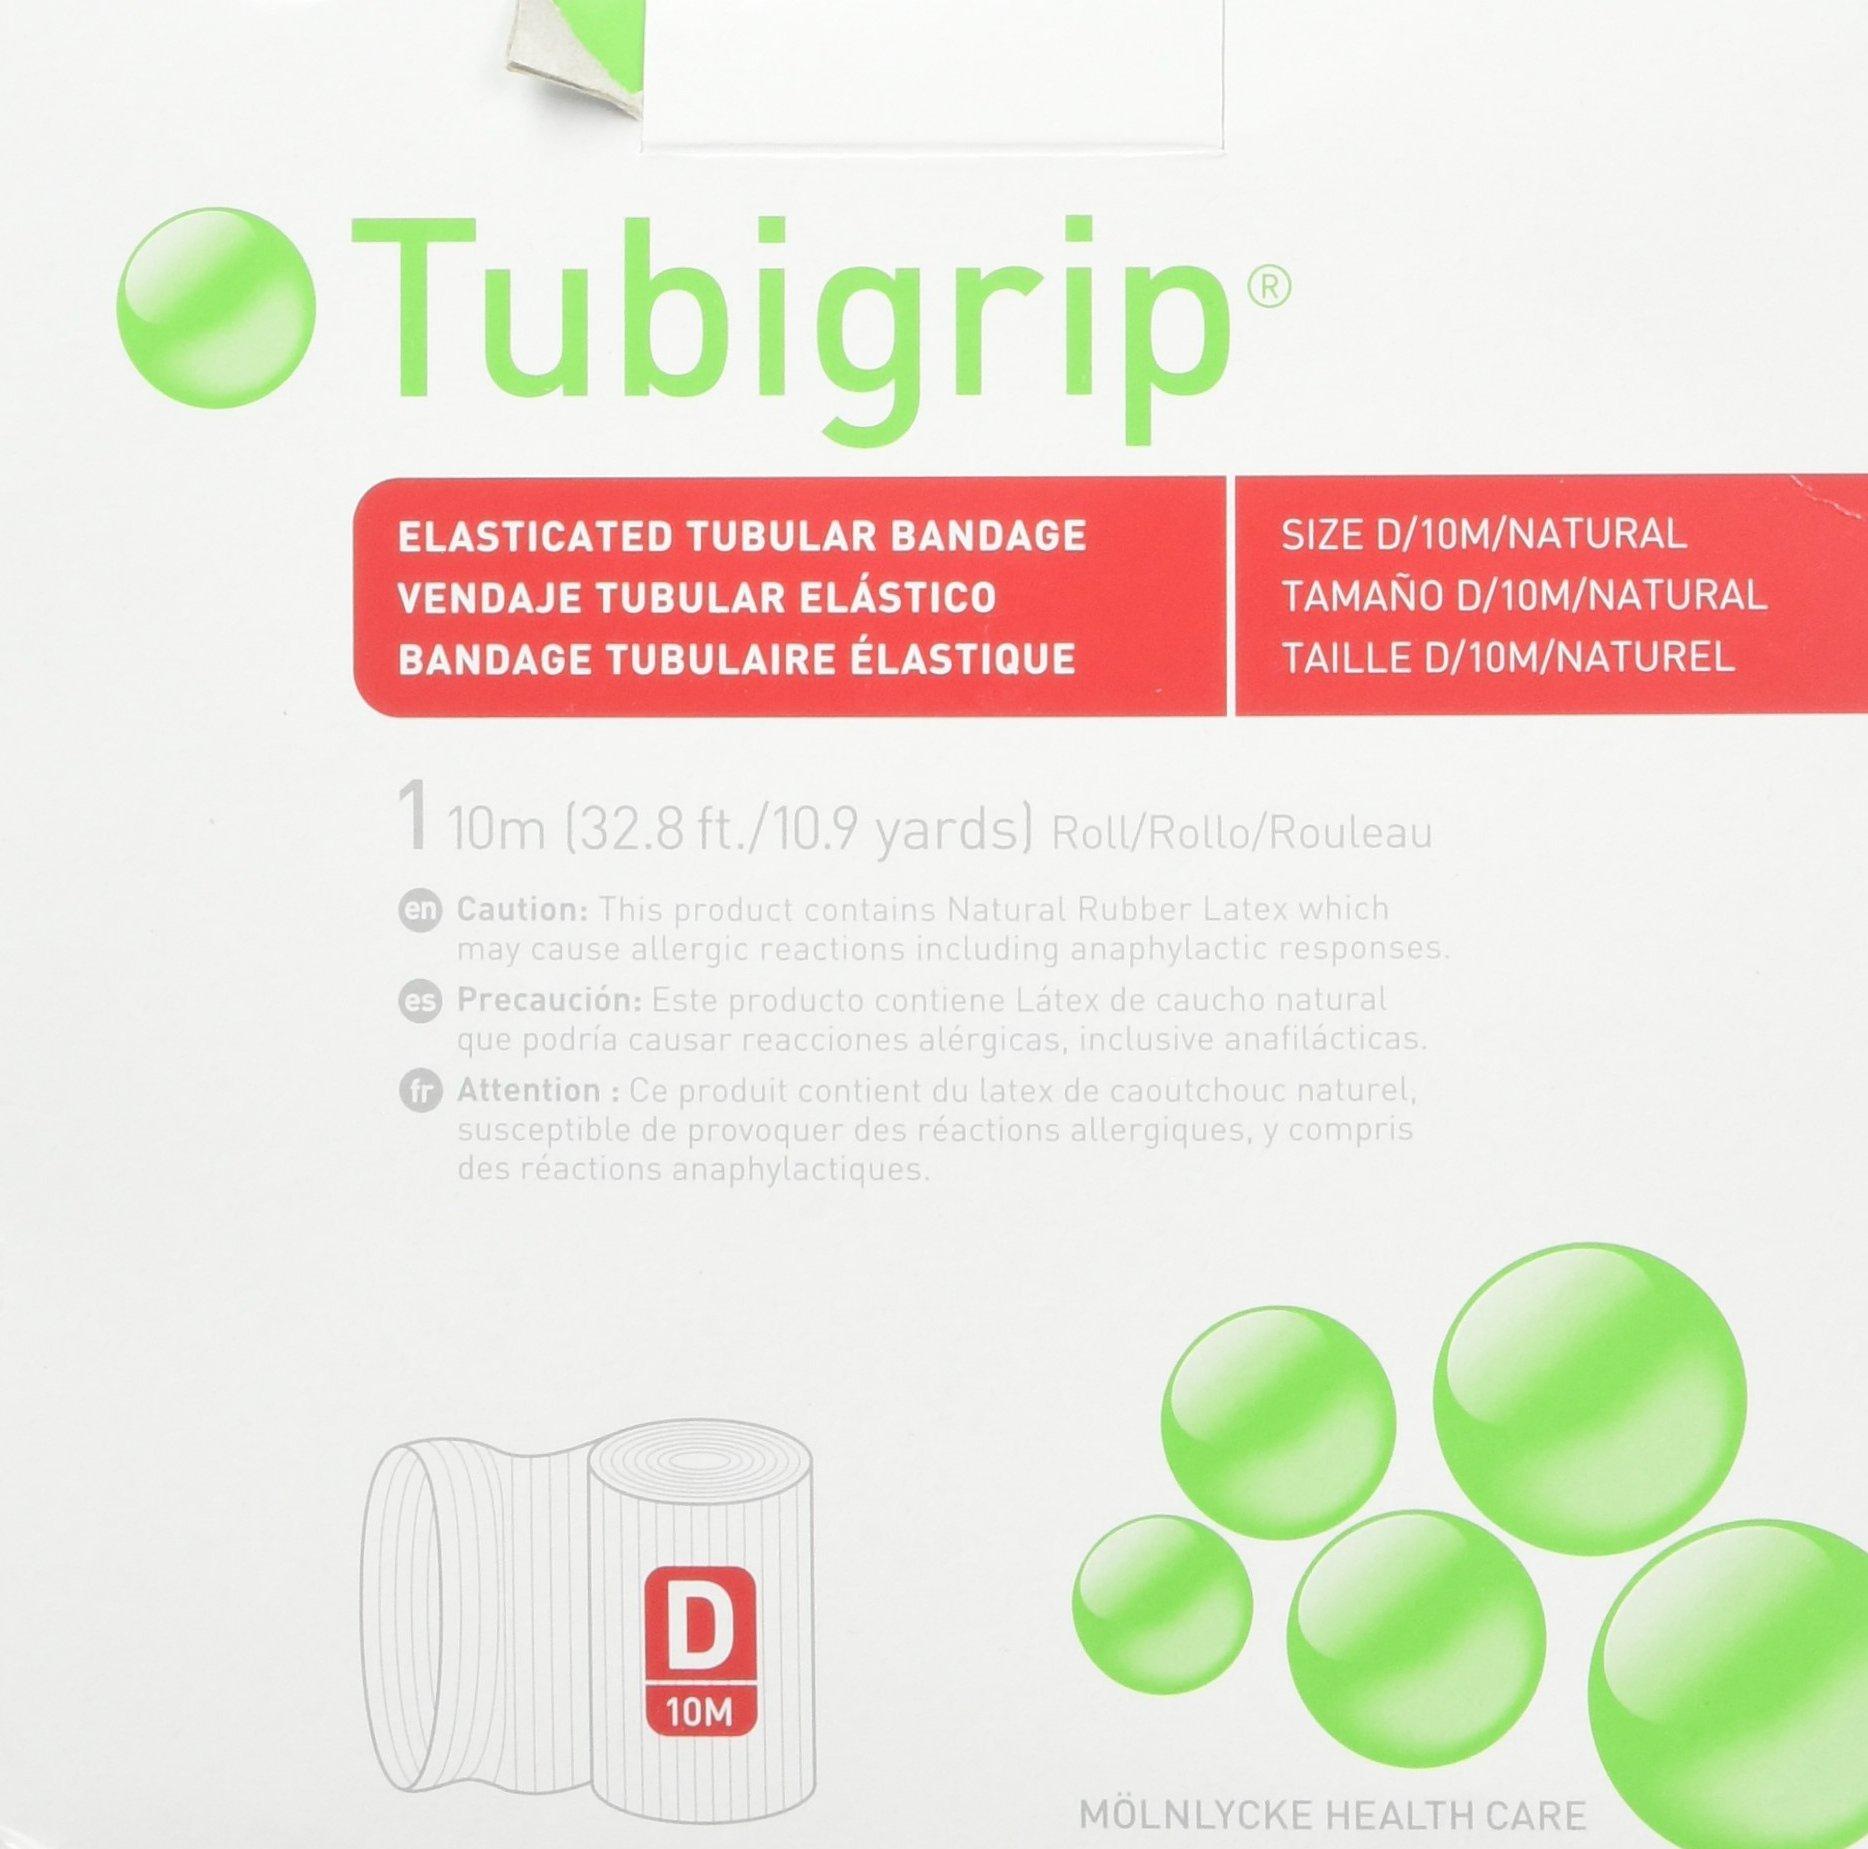 Tubigrip Tubular Bandage Size D, 10M Box (2 Pack) by Tubigrip